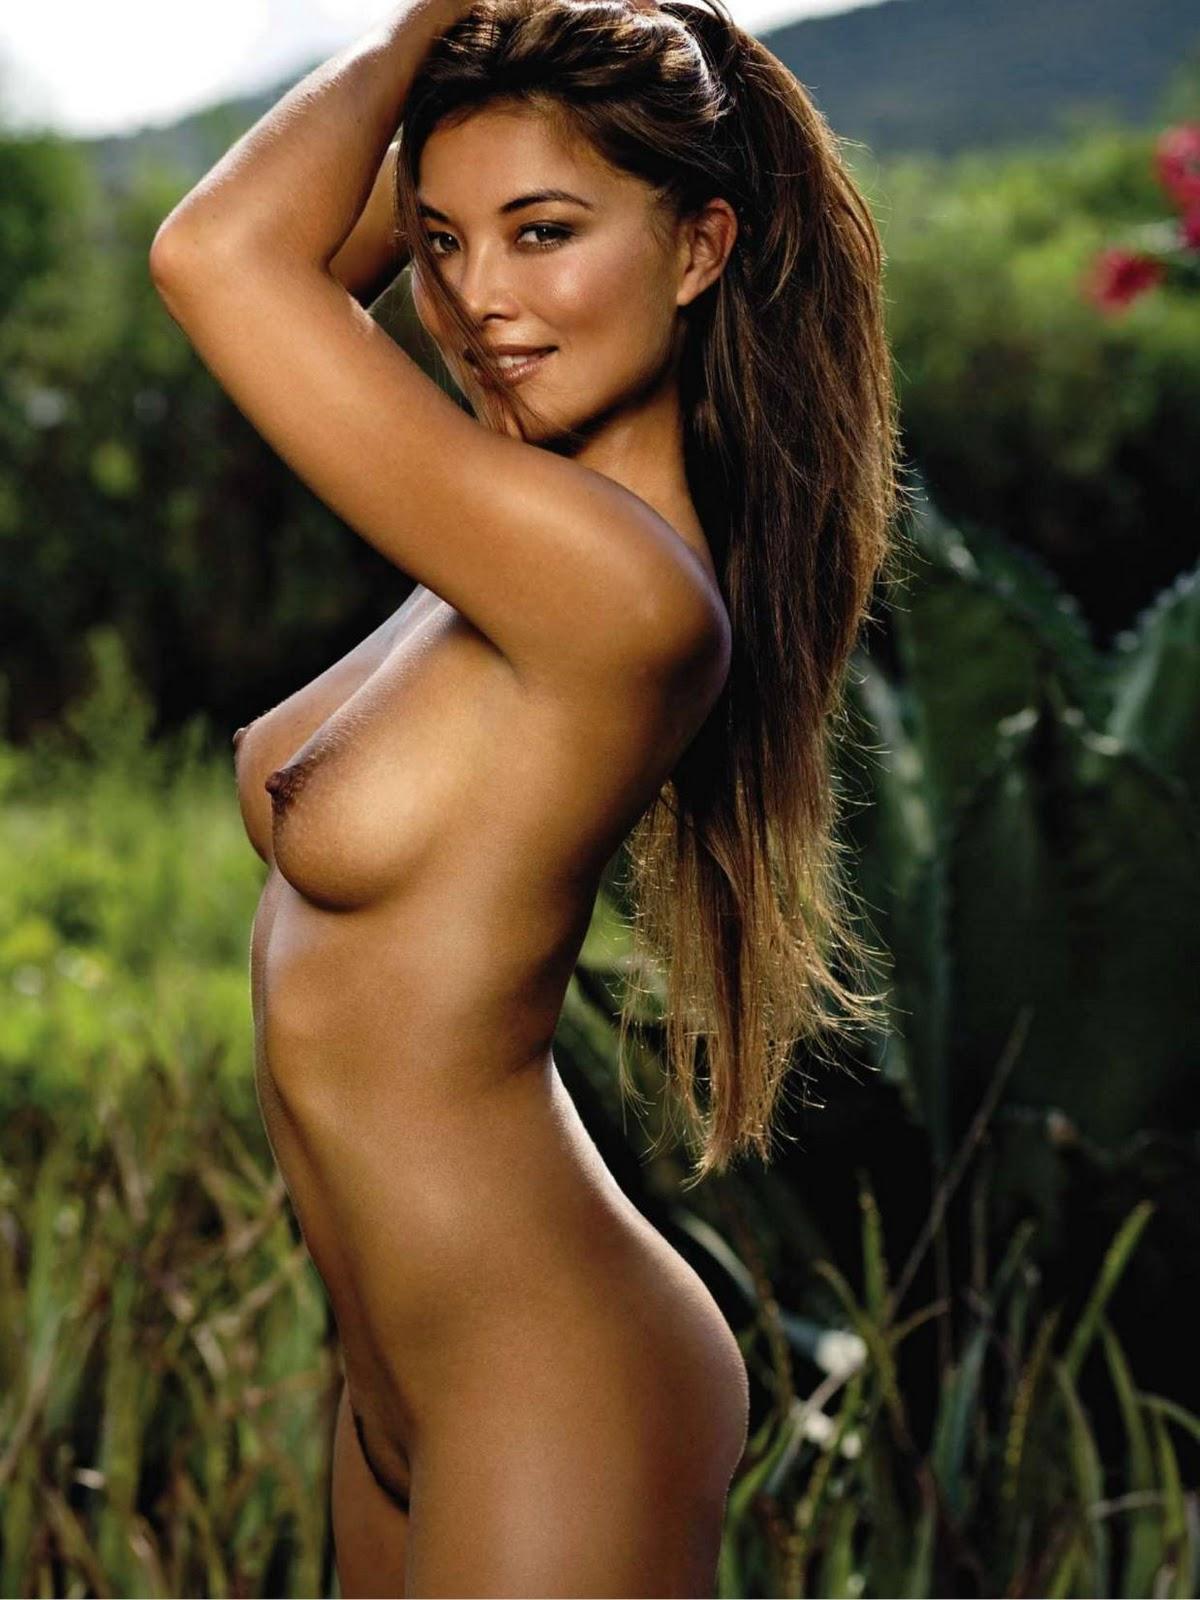 Irene hoek nude are absolutely